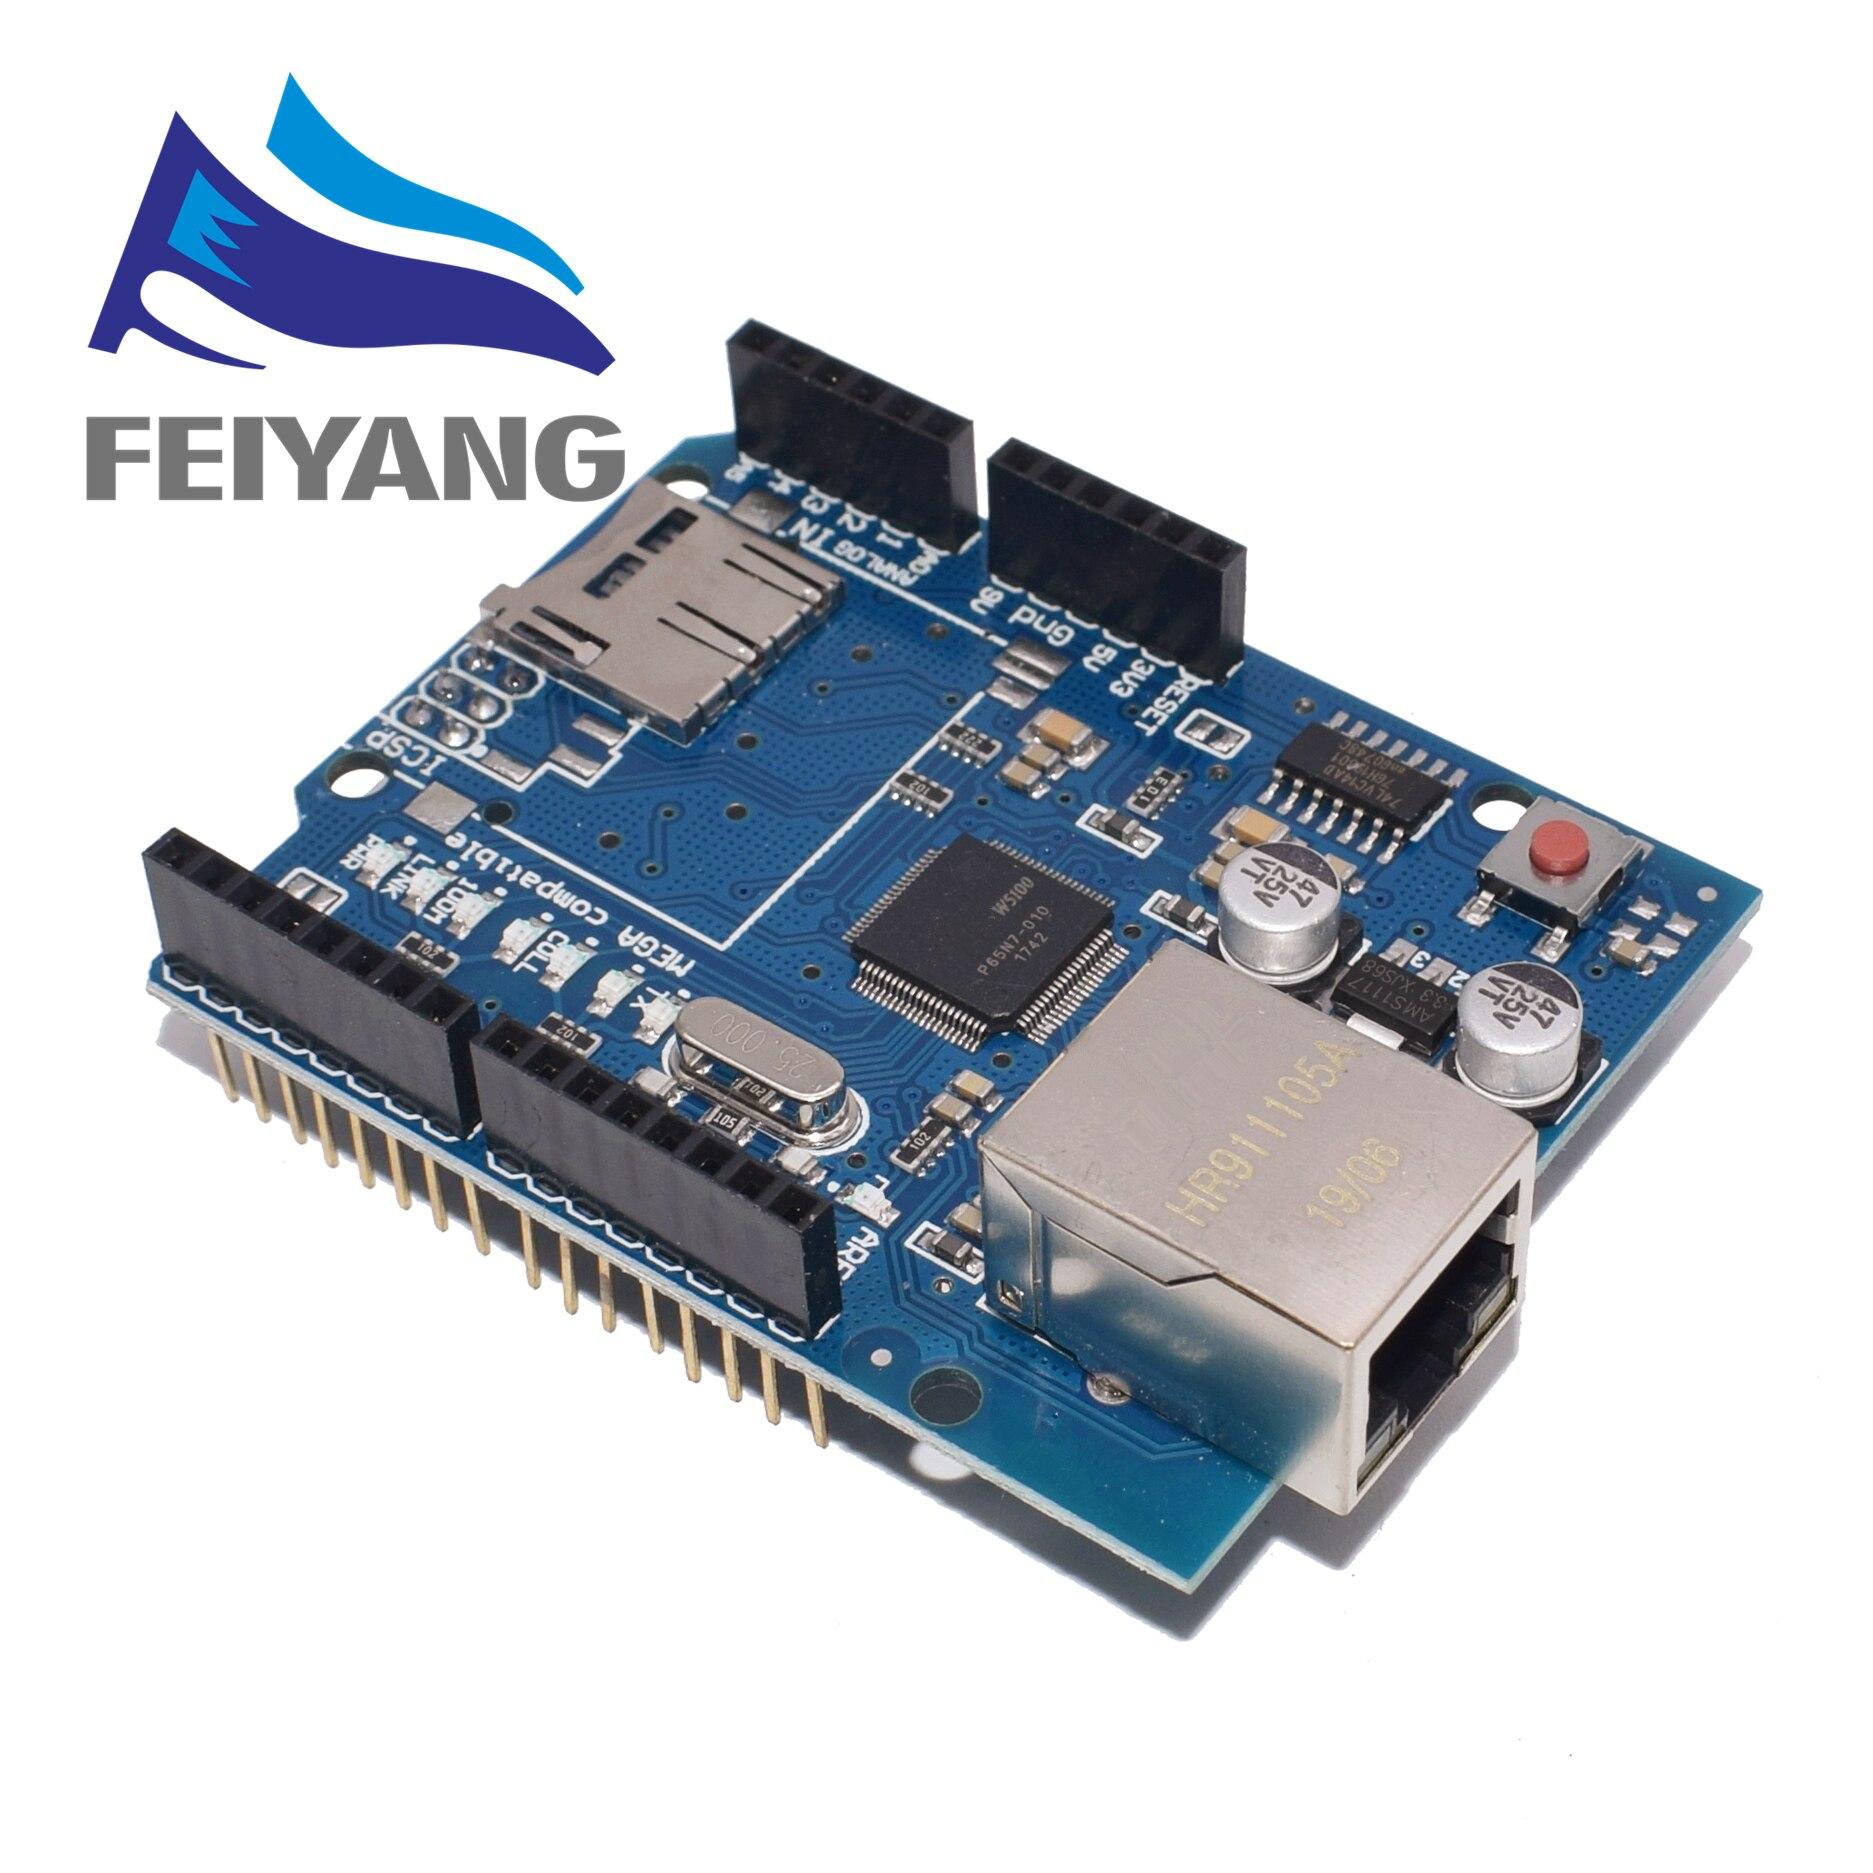 1pcs Shield Ethernet Shield W5100 R3 UNO Mega 2560 1280 328 UNR R3 W5100 Development Board